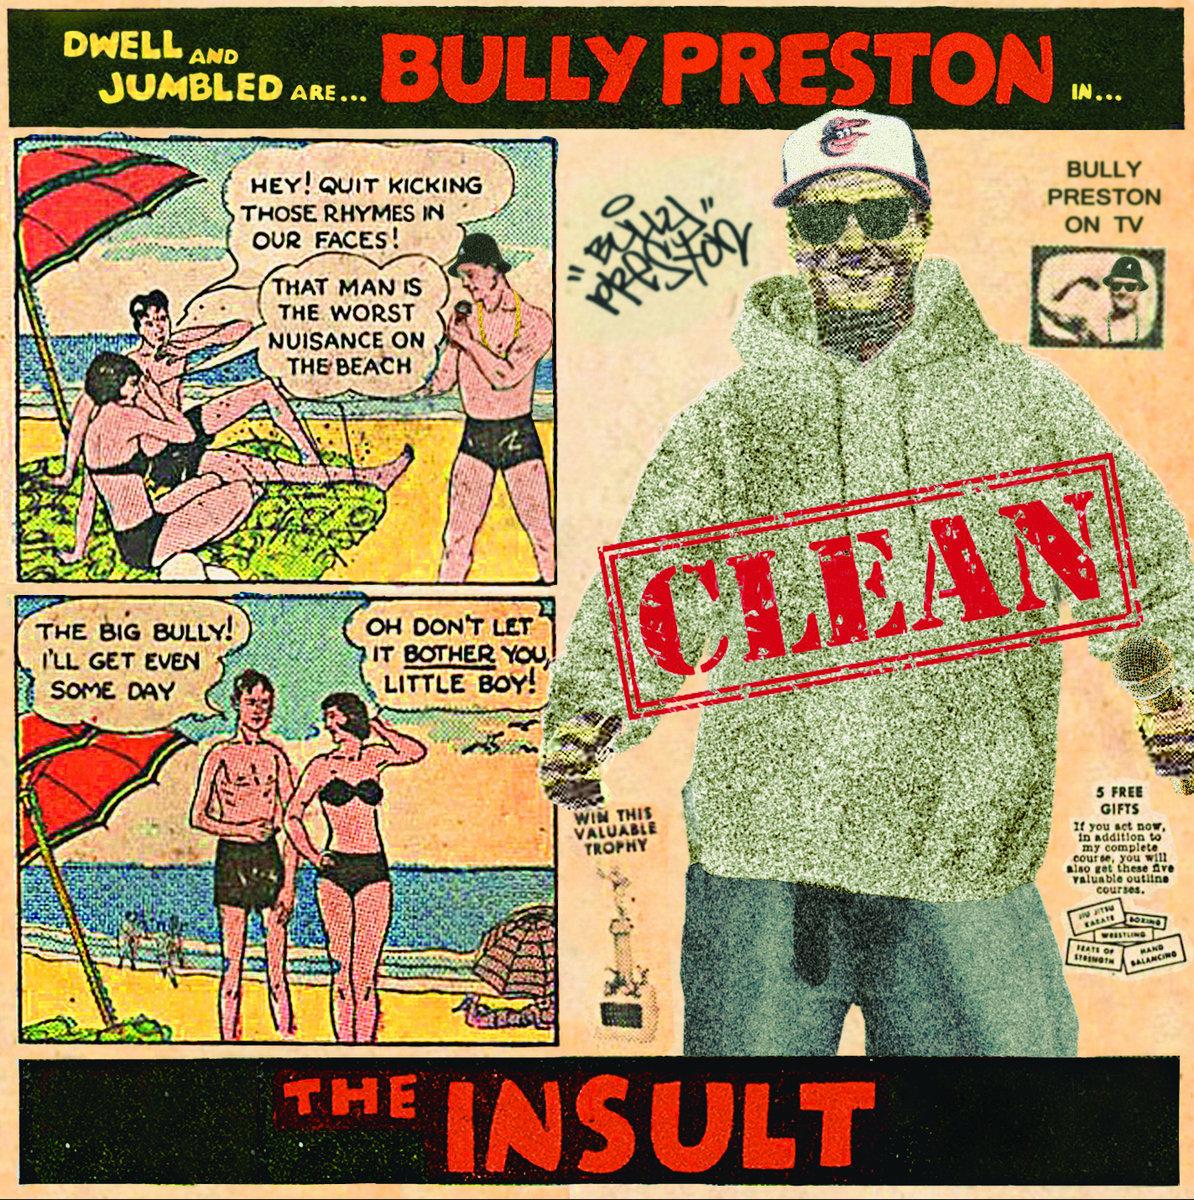 The Insult (Clean) | Bully Preston